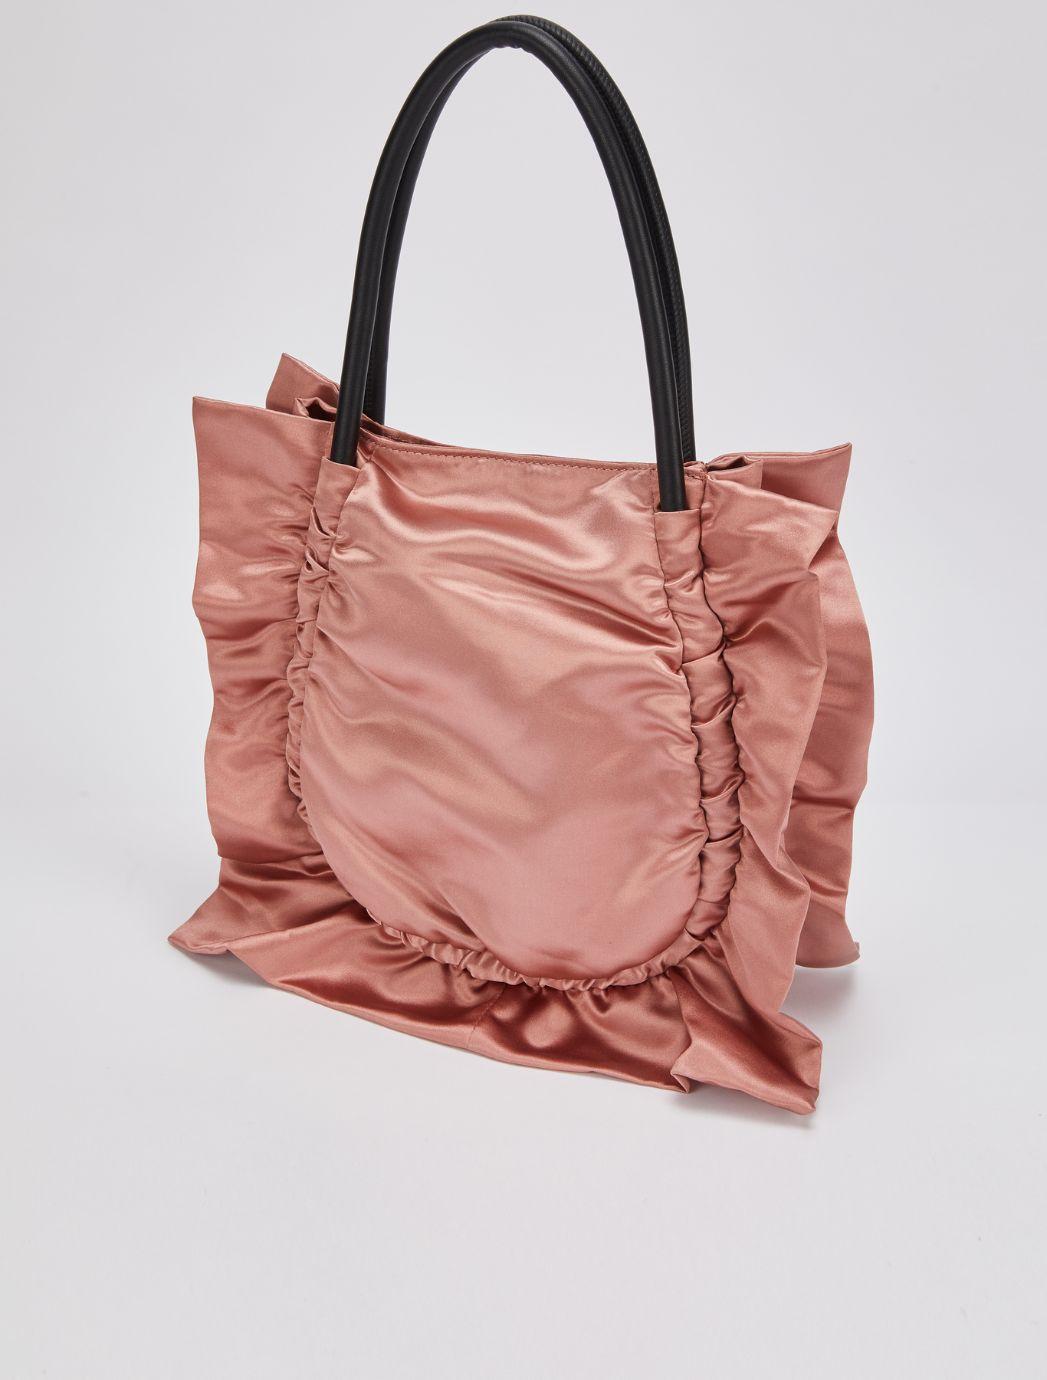 NUDIMINI Handbag old rose 2